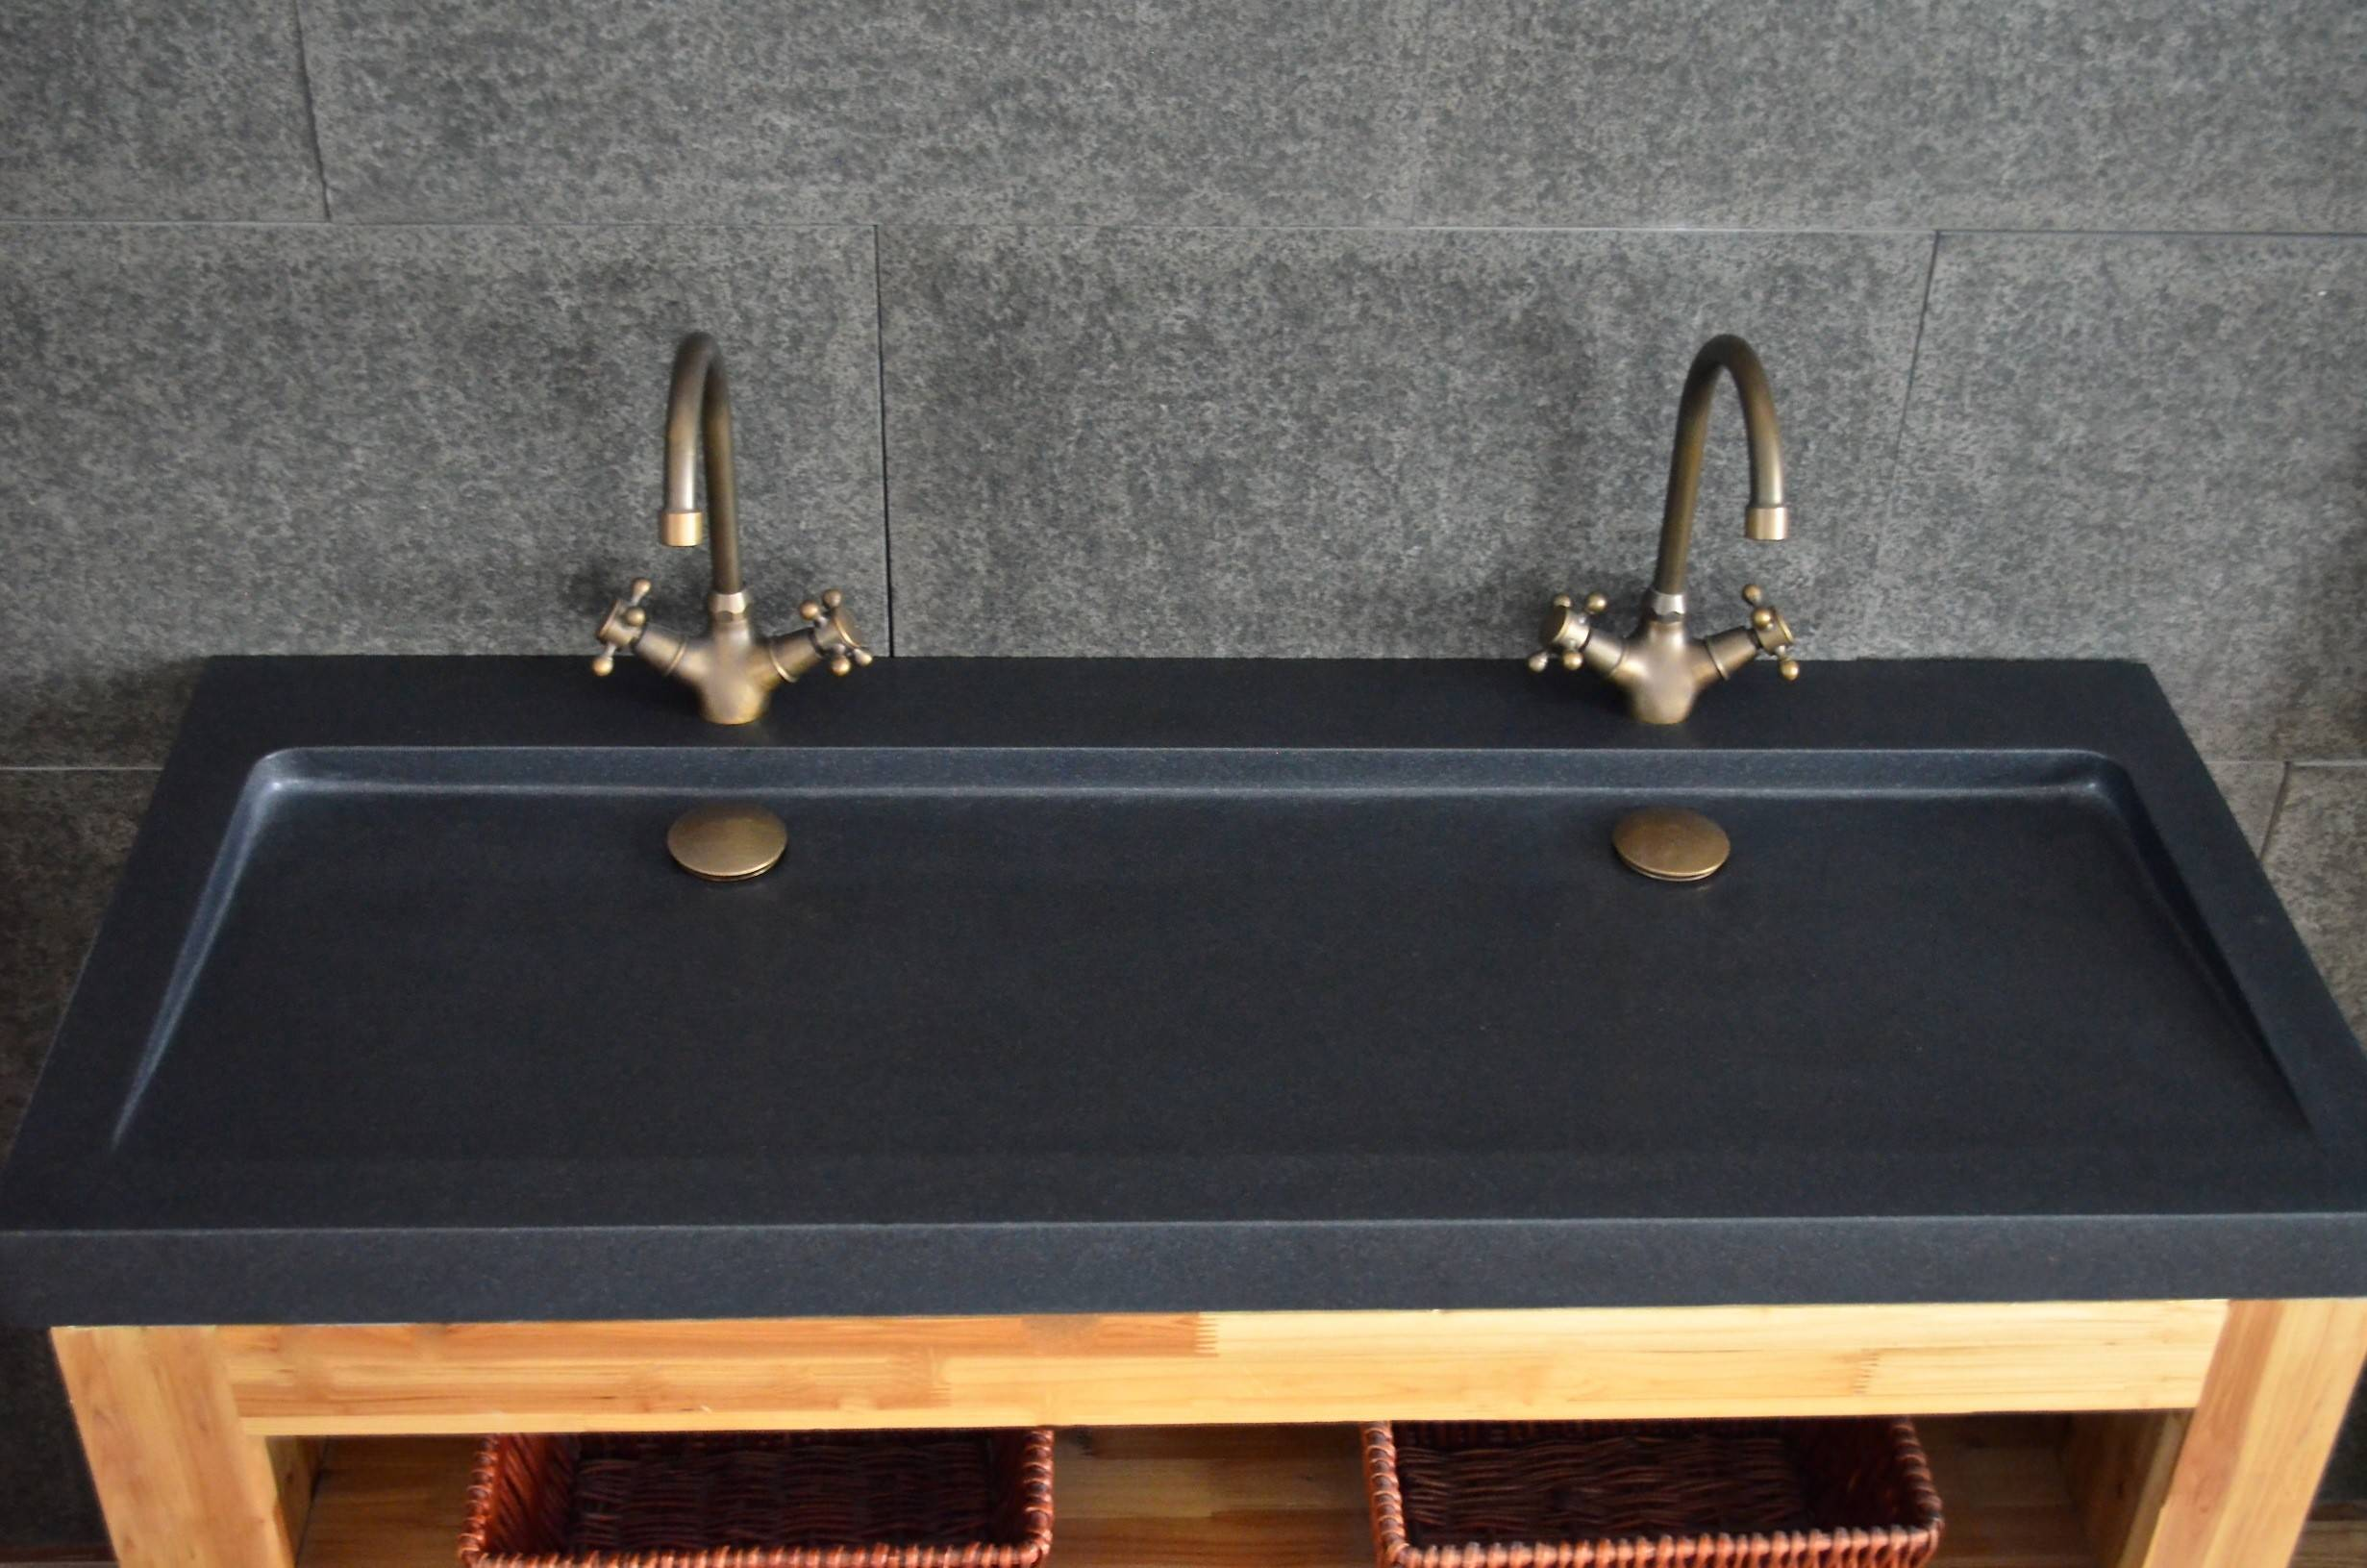 LivingRoc Double vasque salle de bain 120x50 en vrai Granit Noir YATE SHADOW